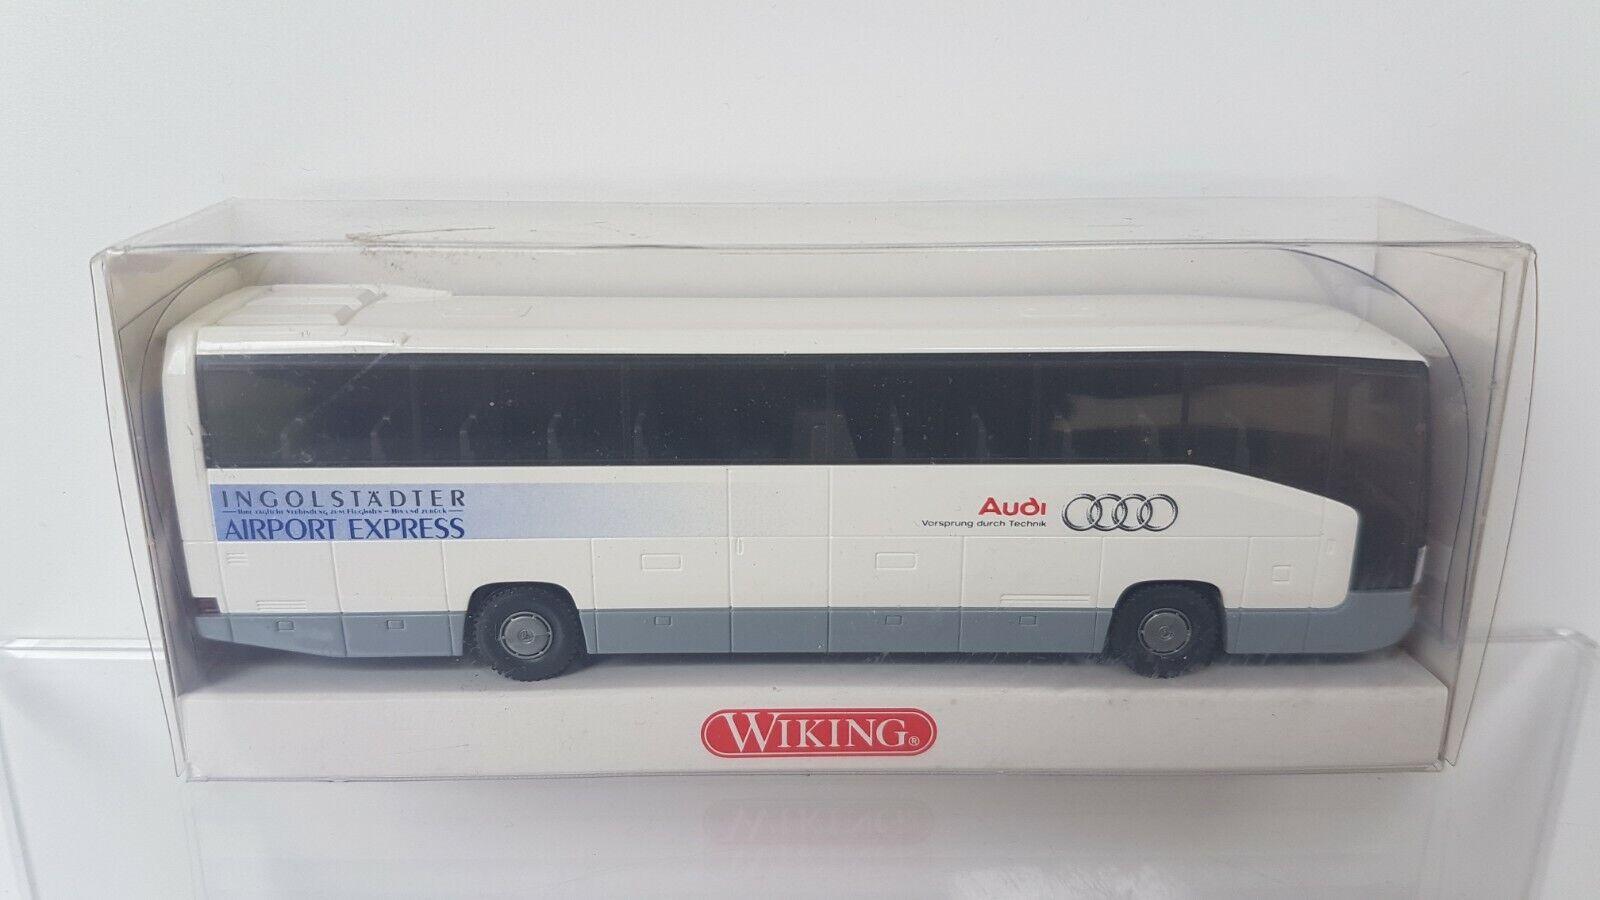 H0  OVP Wiking 7140836 MB O 404 RHD  Bus Airport Express Ingolstadt Audi  1:87